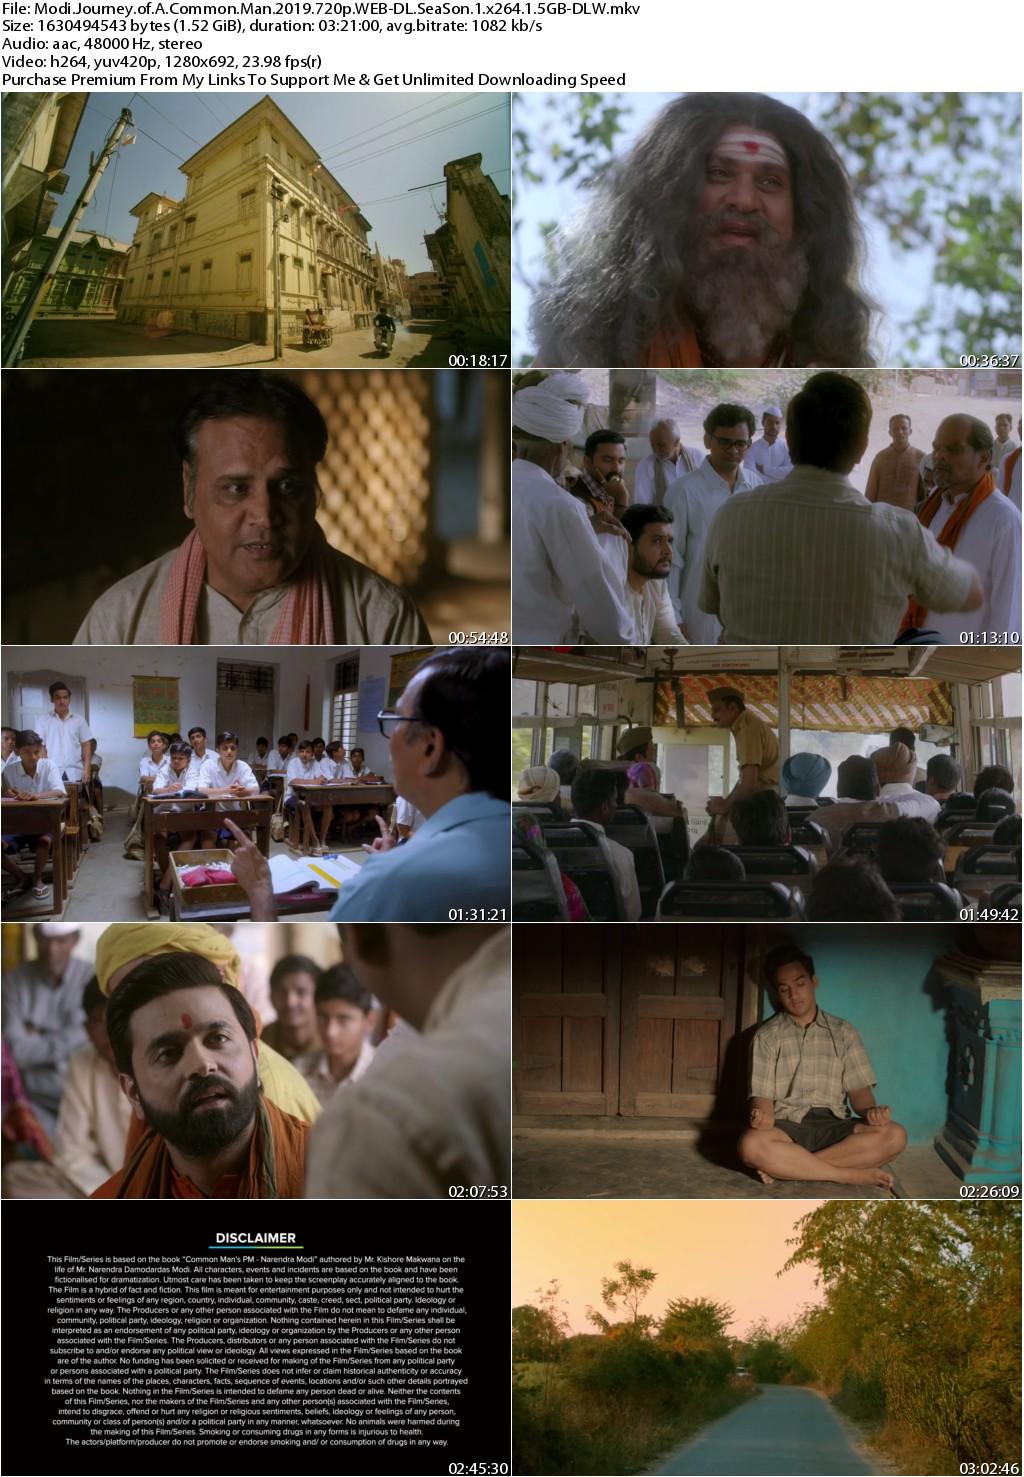 Modi Journey of A Common Man 2019 720p WEB-DL SeaSon 1 x264 1.5GB-DLW